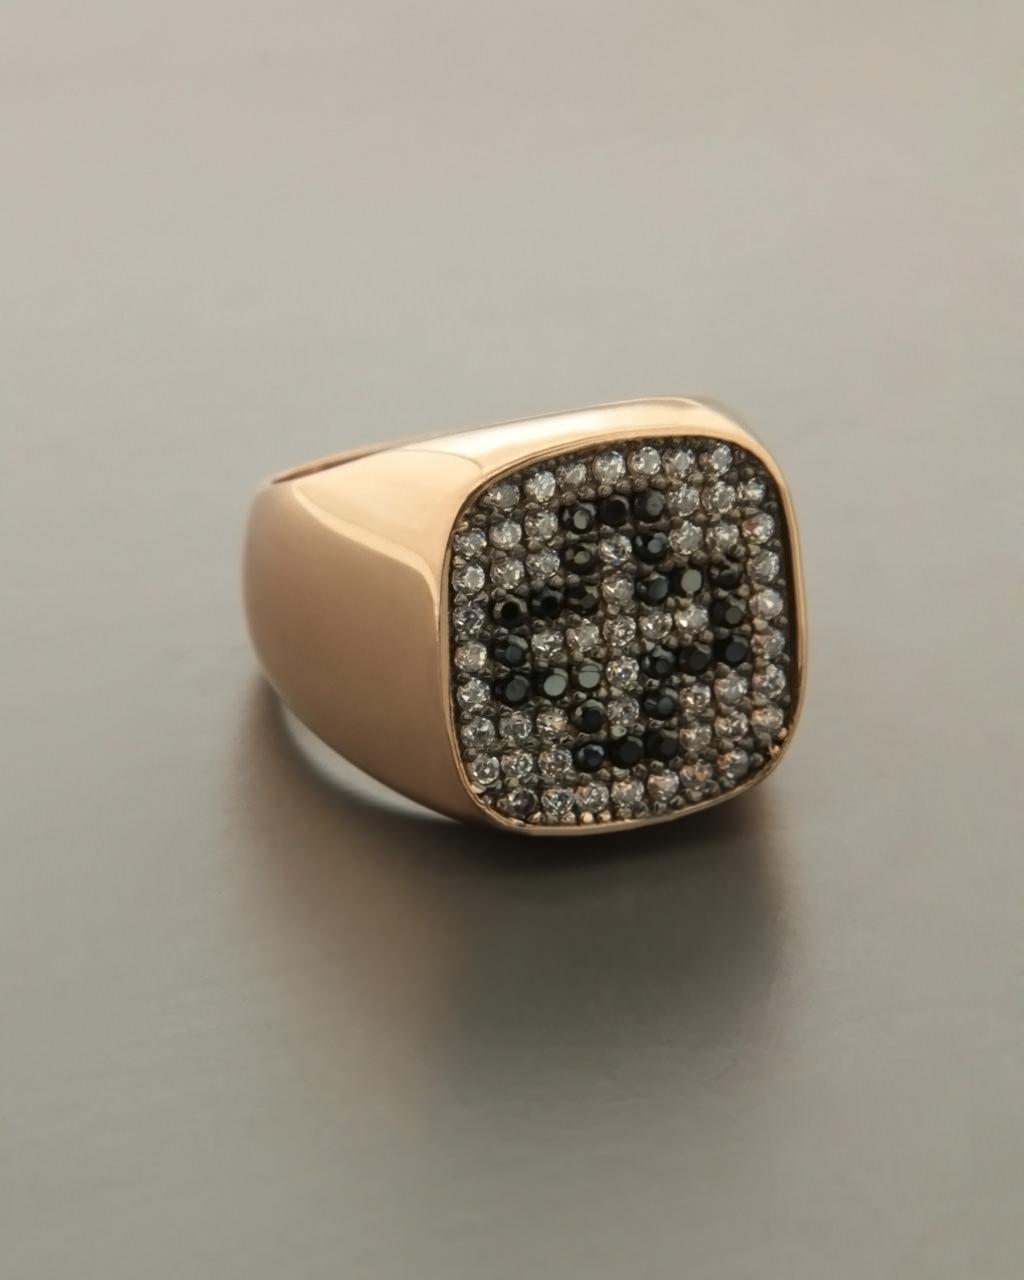 41337e7197 Δαχτυλίδι σεβαλιέ ασημένιο 925 με Zιργκόν Η Καρδιά Μου